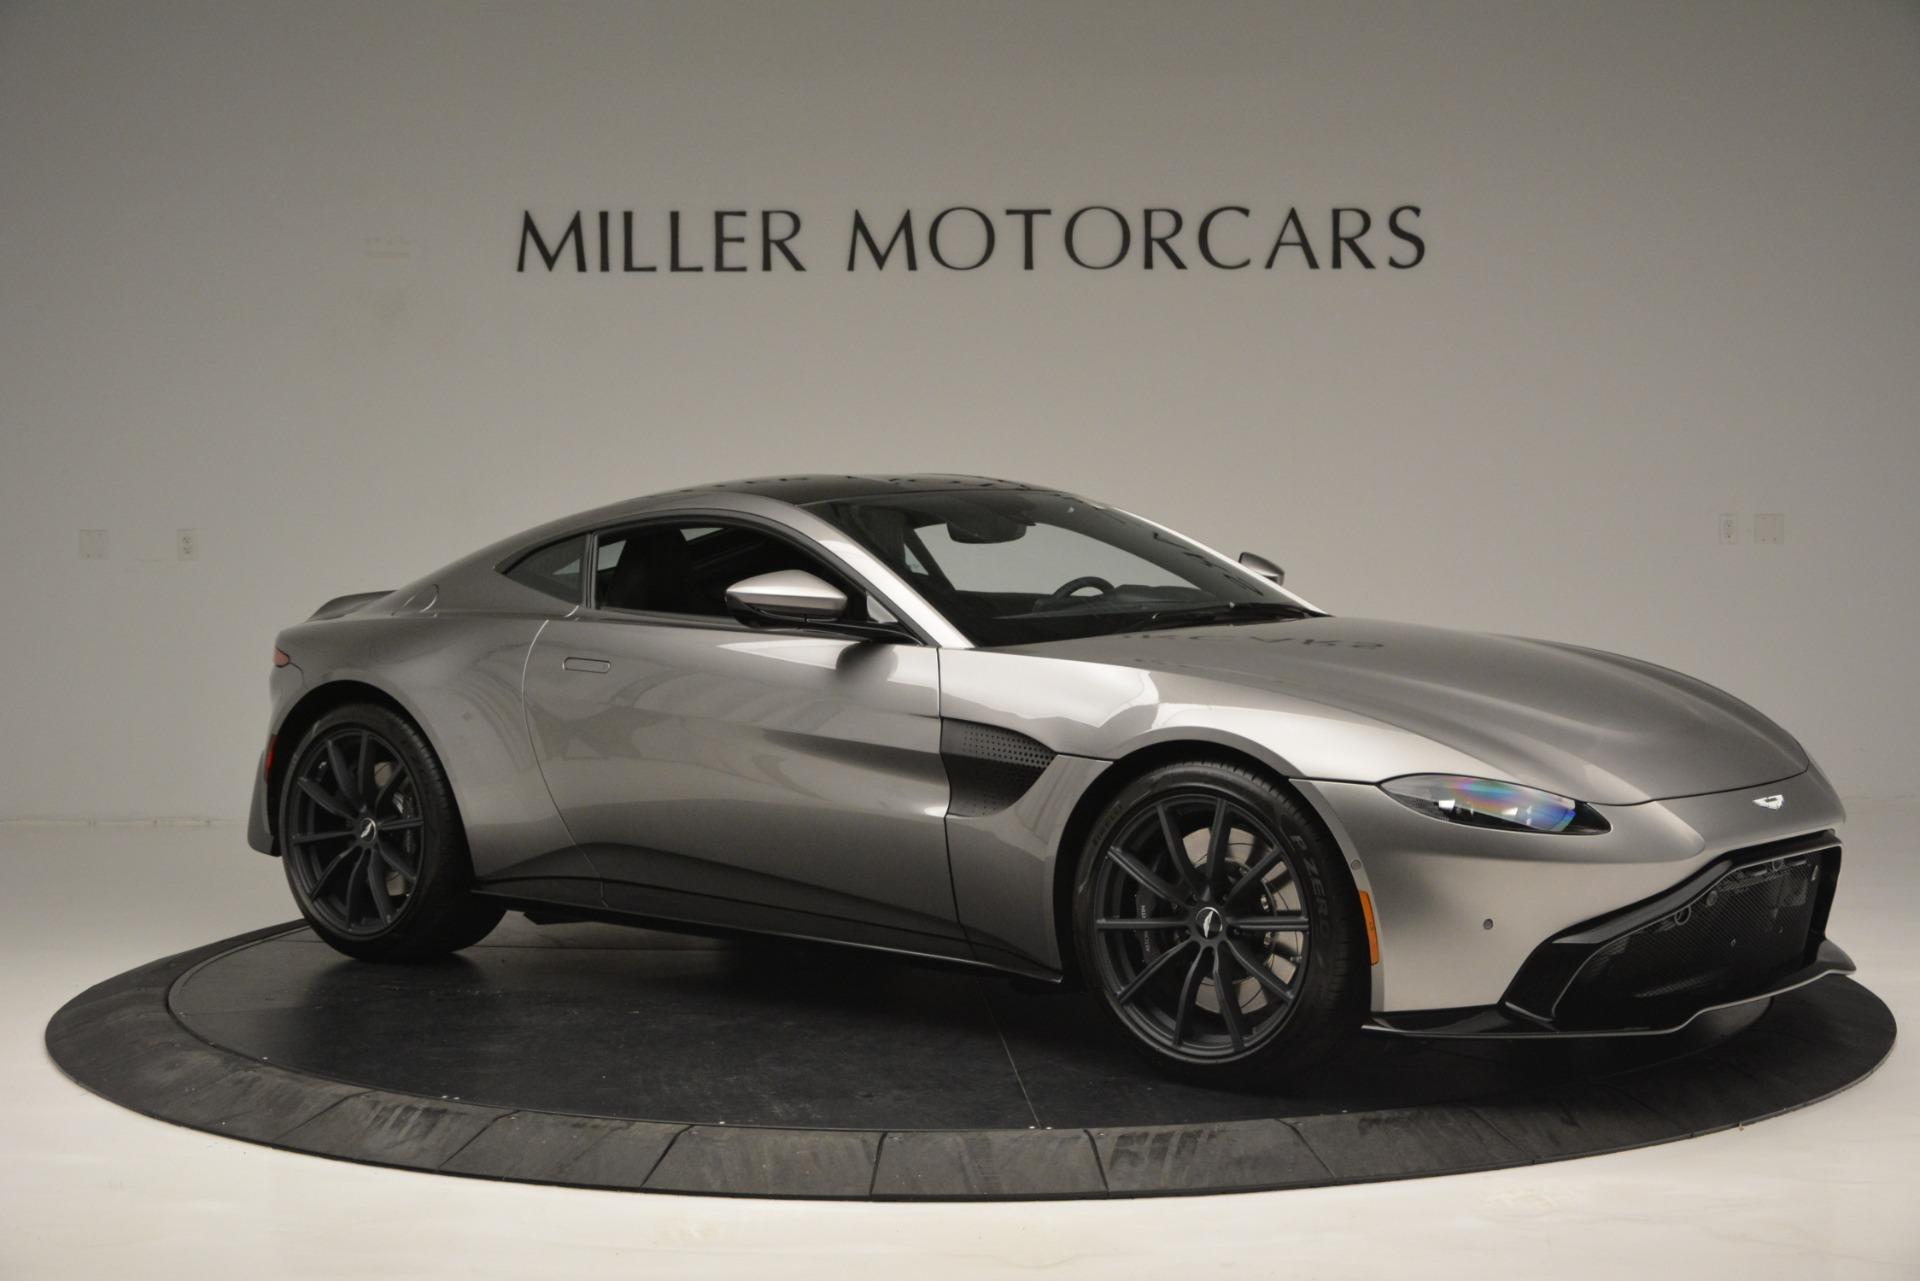 New 2019 Aston Martin Vantage Coupe For Sale In Greenwich, CT. Alfa Romeo of Greenwich, A1335 3122_p10